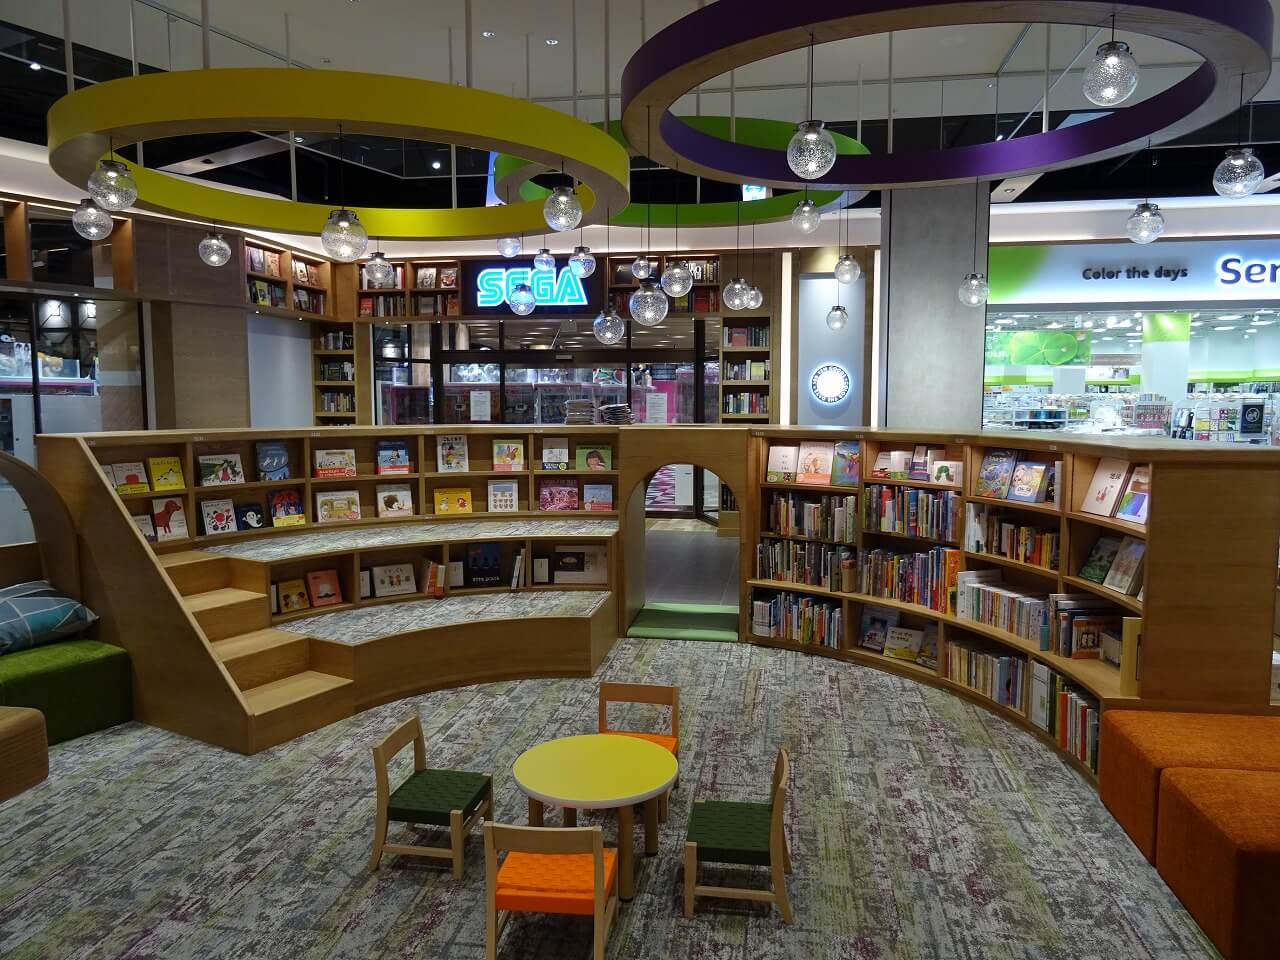 tsutaya-bookstore-mirai-nagasaki-cocowalk6